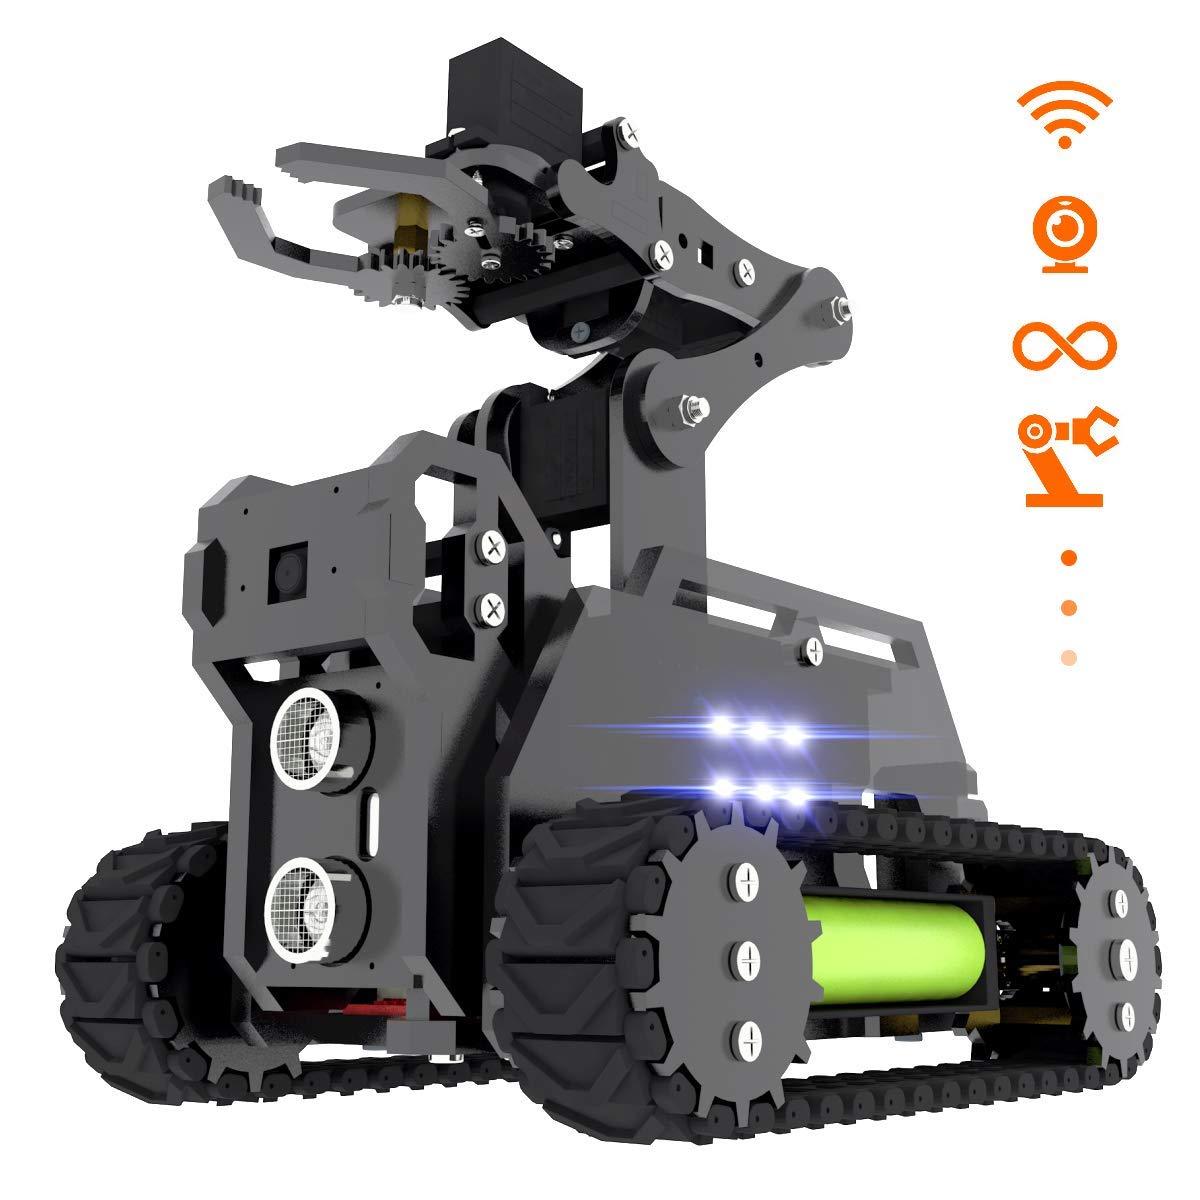 Adeept RaspTank Smart Robot Car Kit